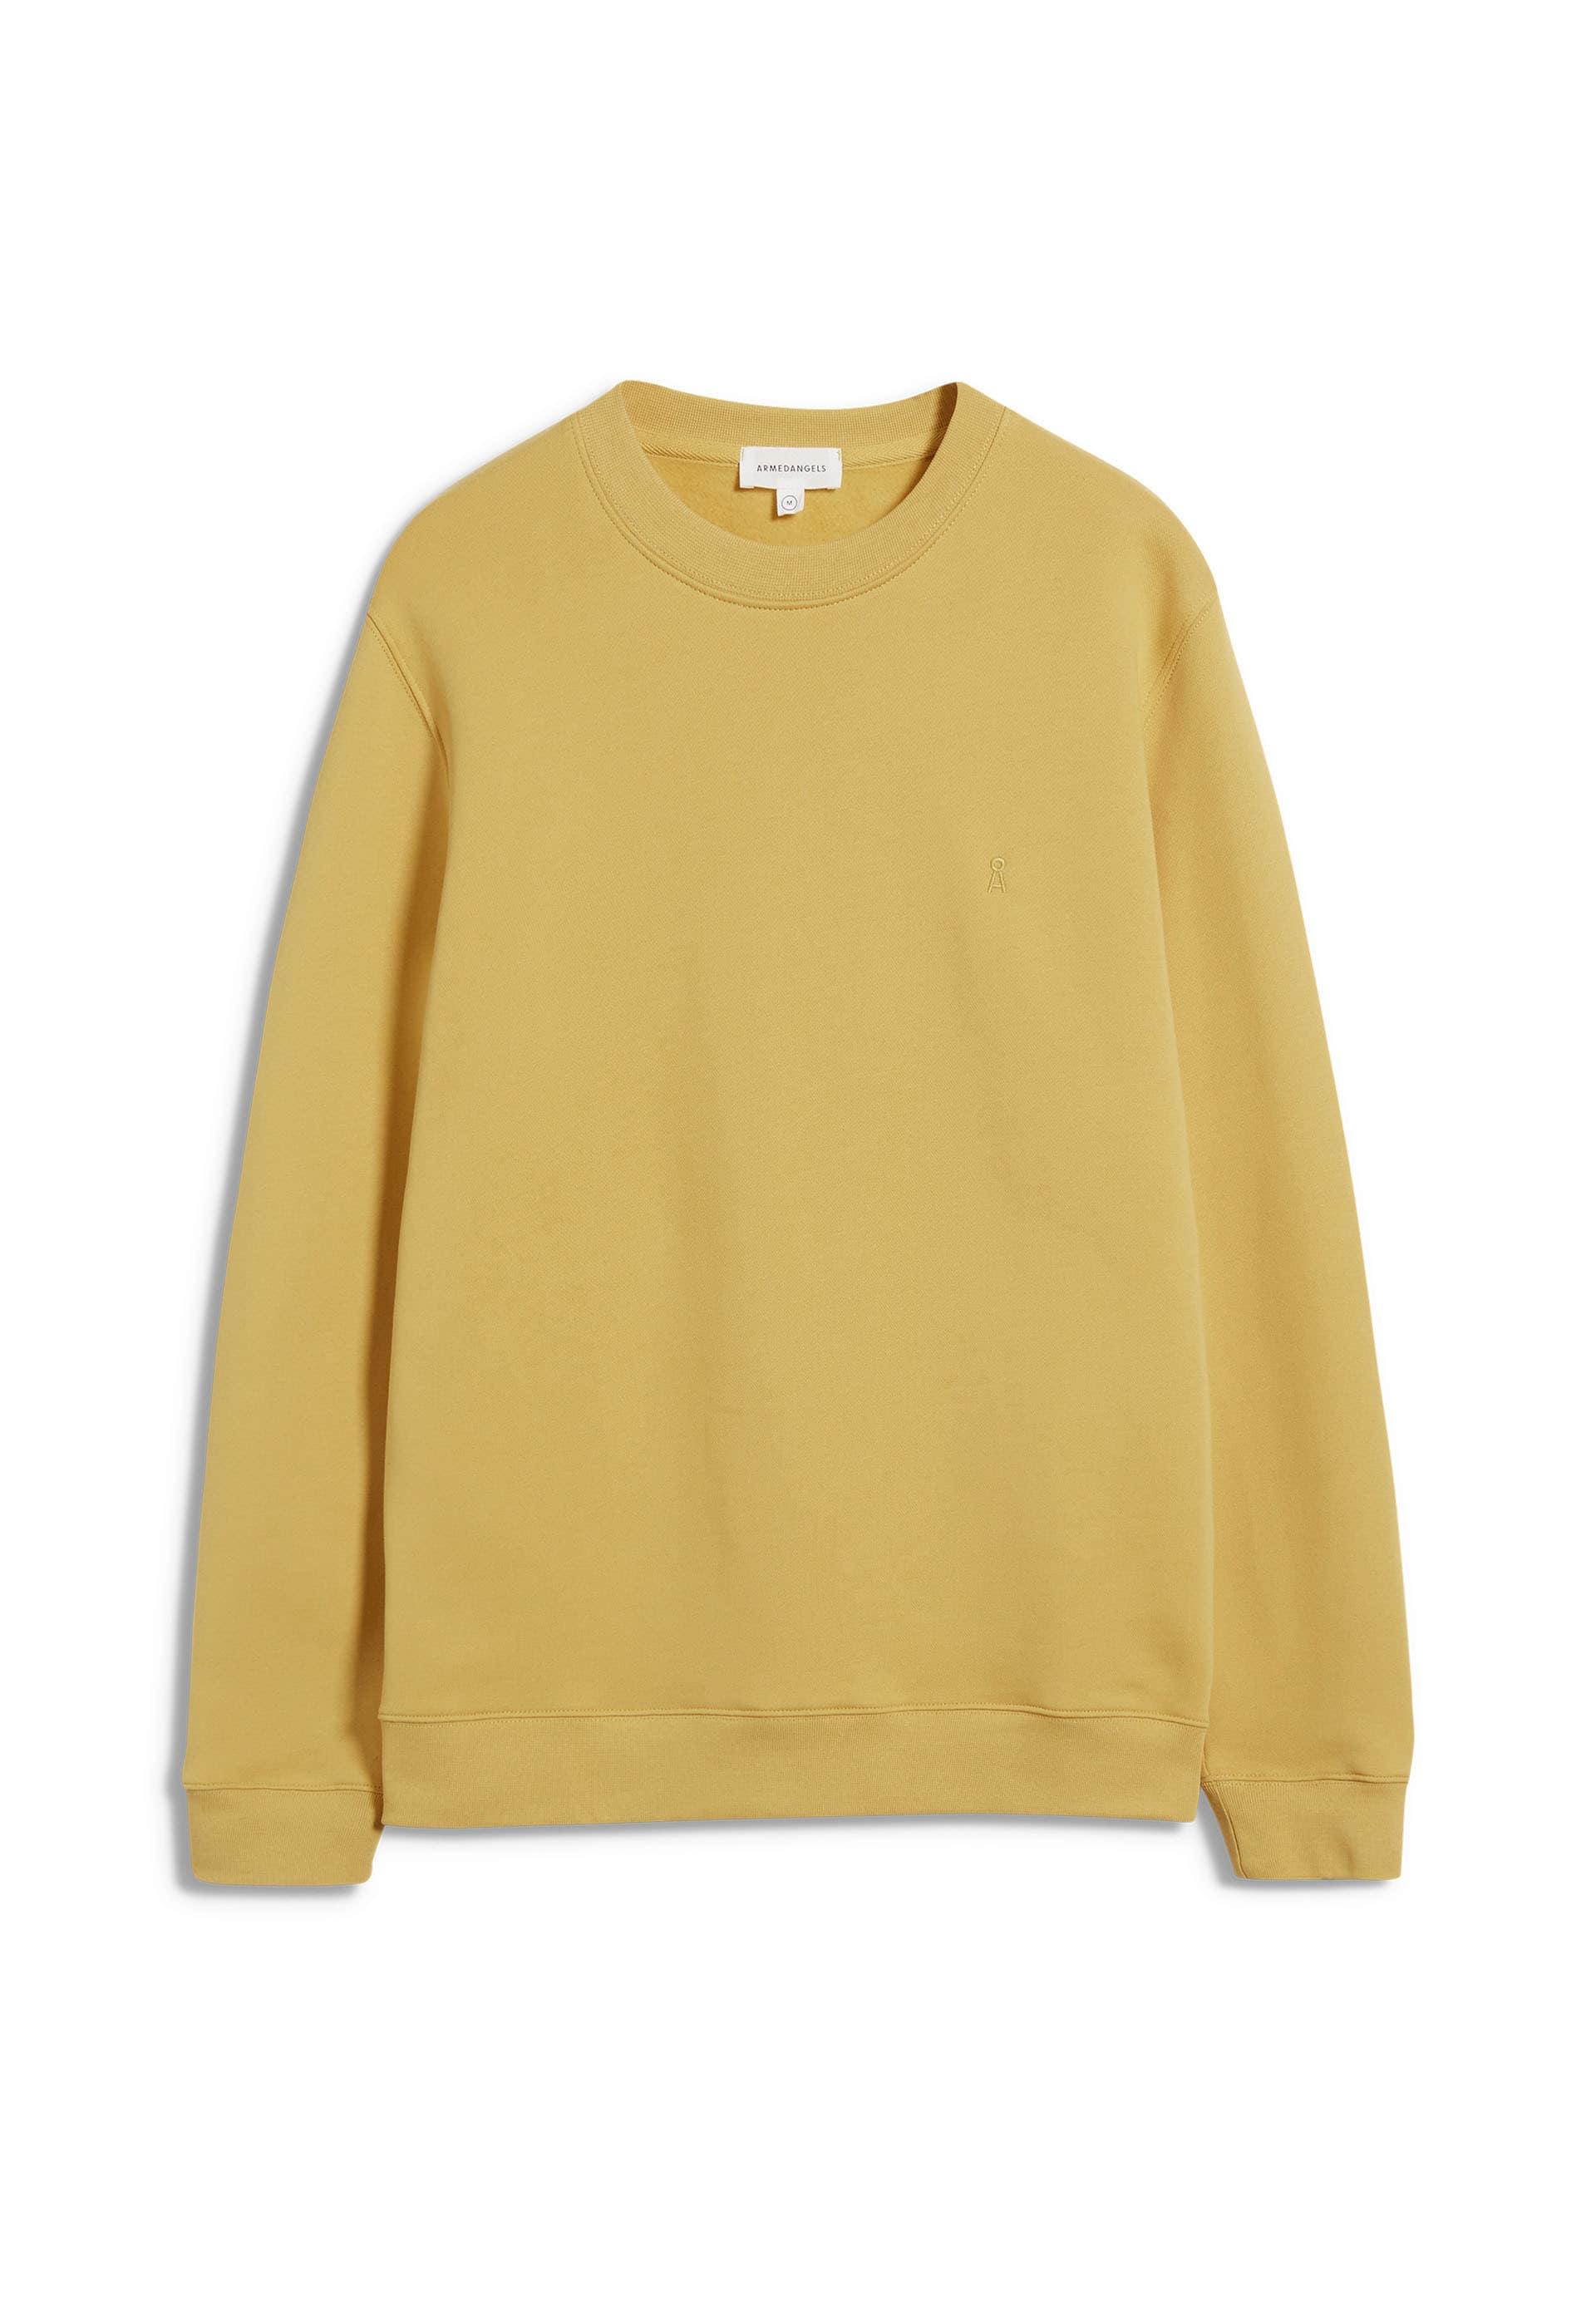 MAALTE COMFORT Sweatshirt aus Bio-Baumwolle